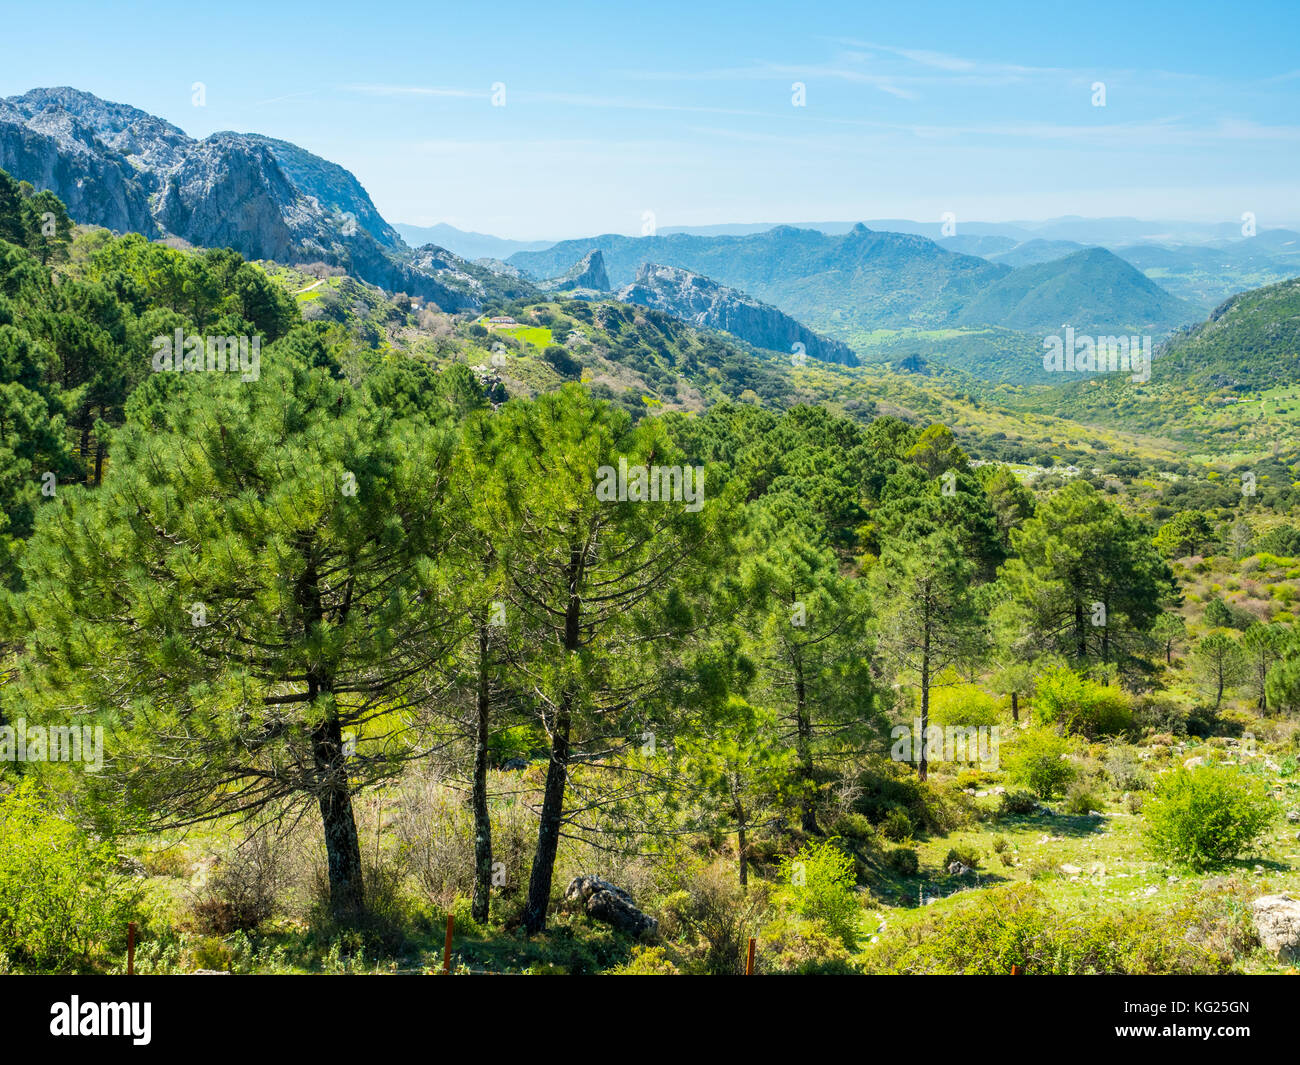 Sierra de Grazalema, Andalusien, Spanien, Europa Stockbild